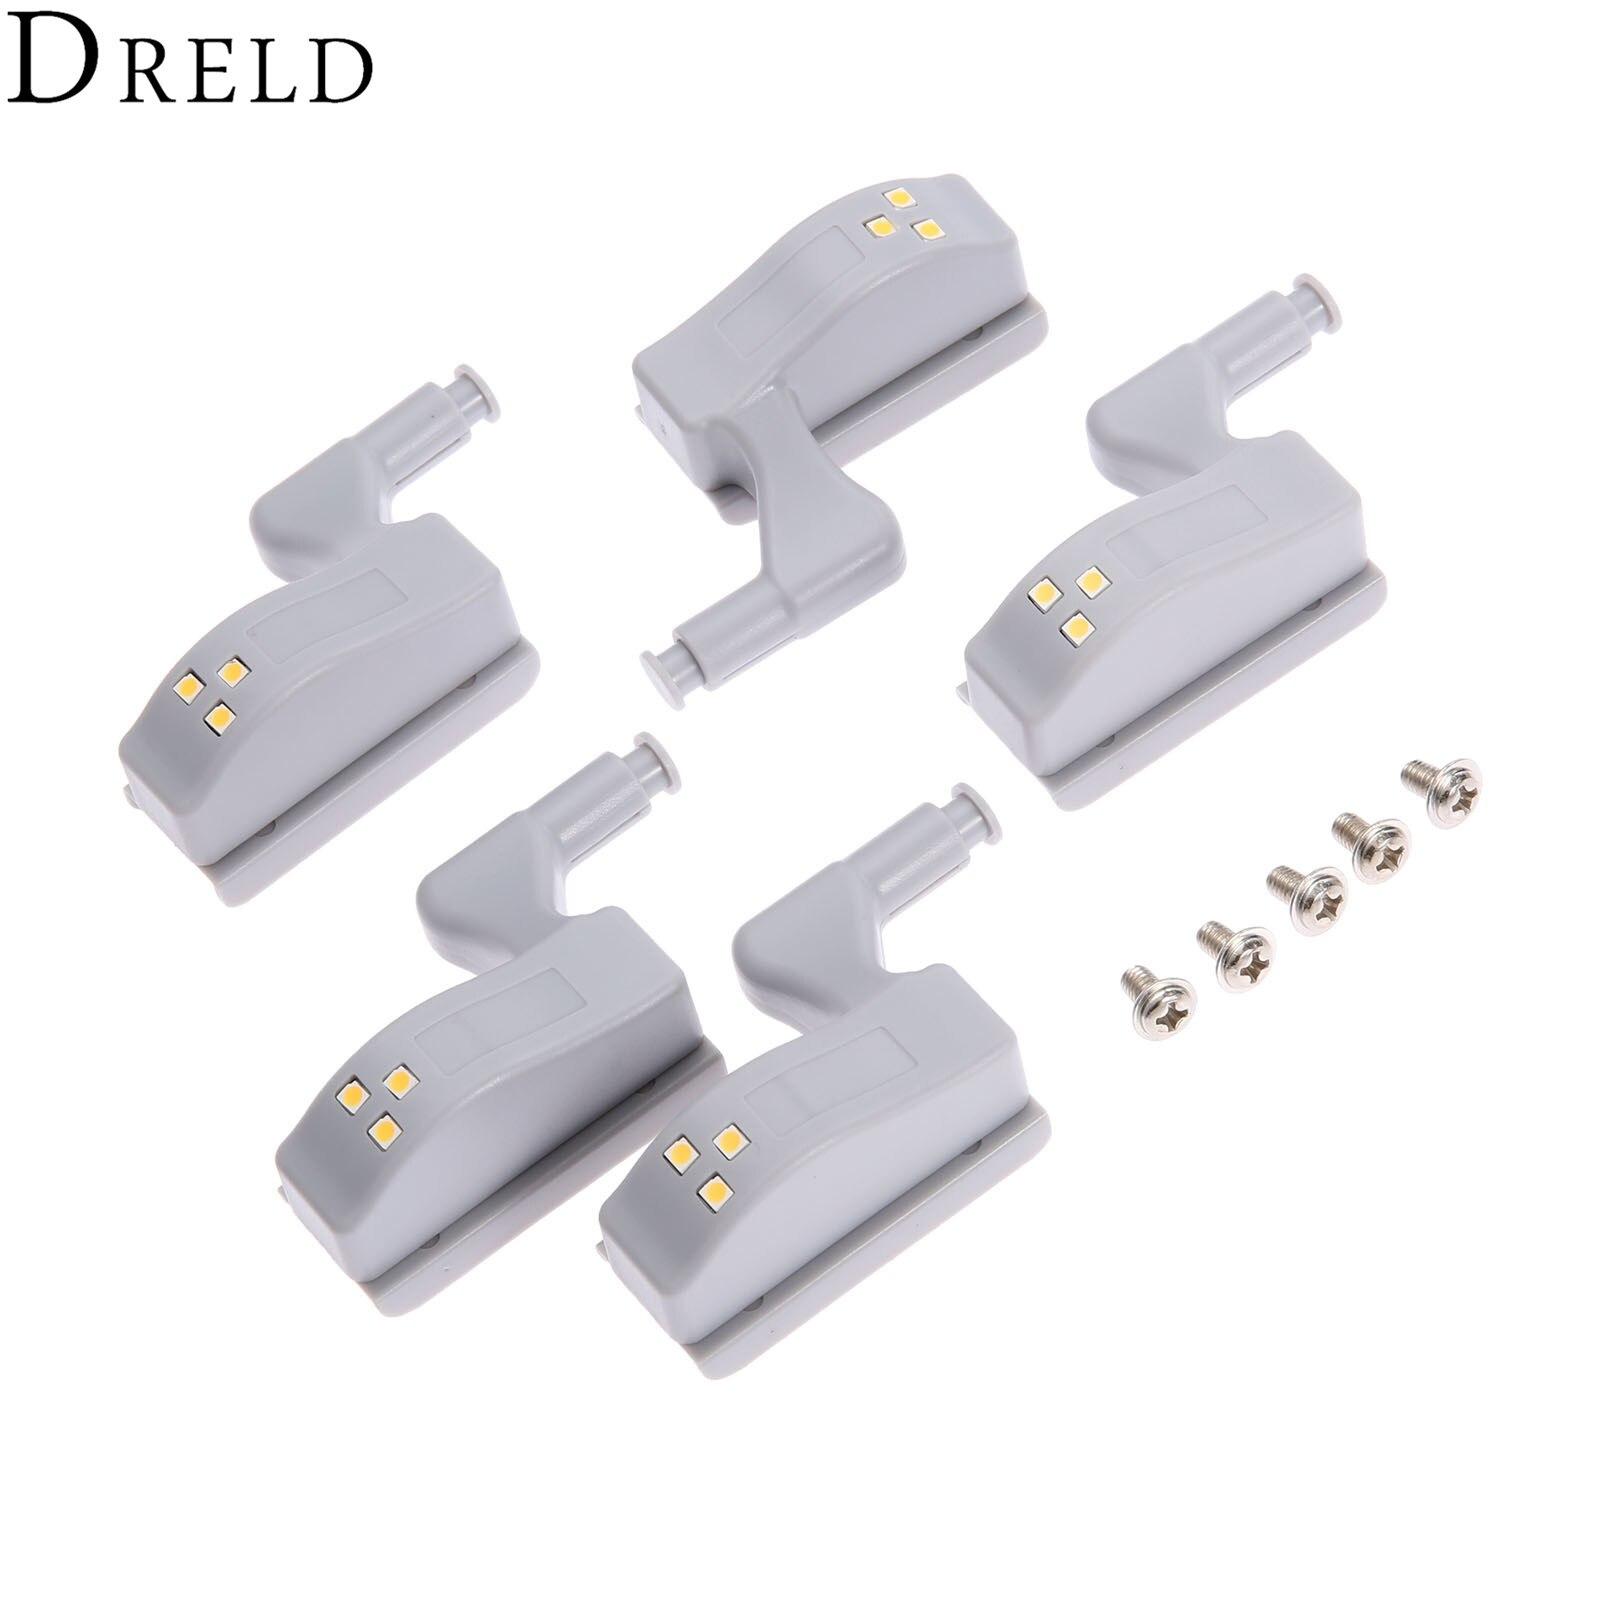 DRELD 5Pcs Universal Inner Hinge LED Sensor Cabinet Light For Kitchen Bedroom Living Room Cupboard Wardrobe Closet Hinge Light